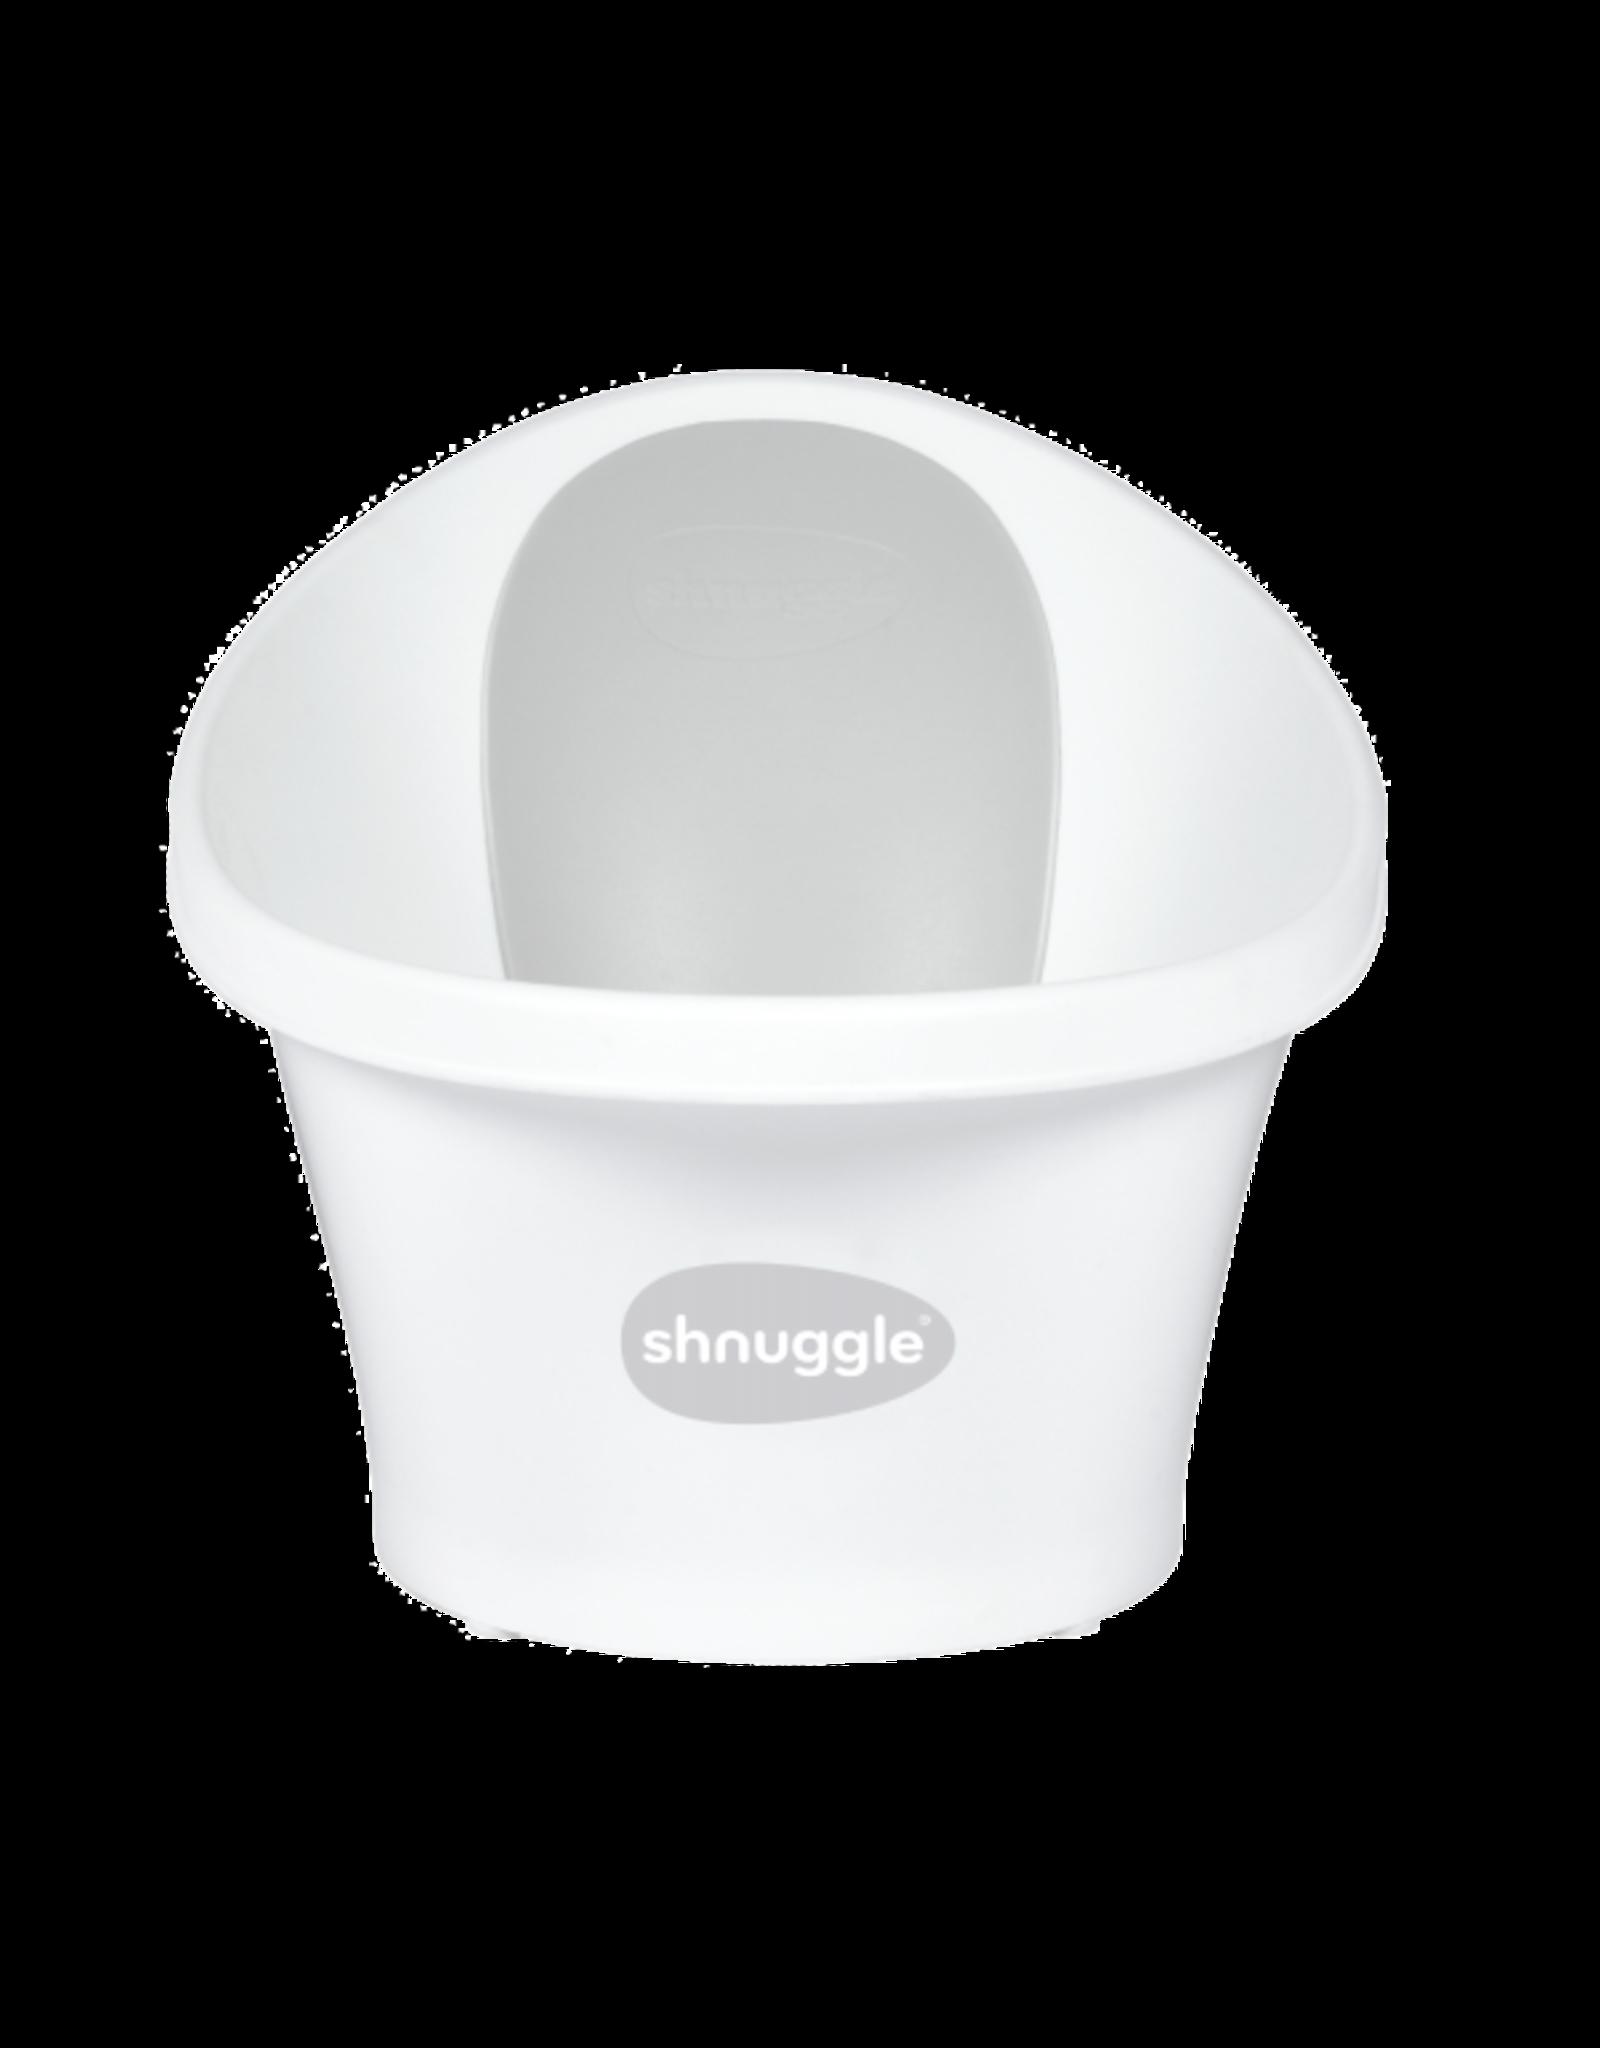 Shnuggle Shnuggle Bath